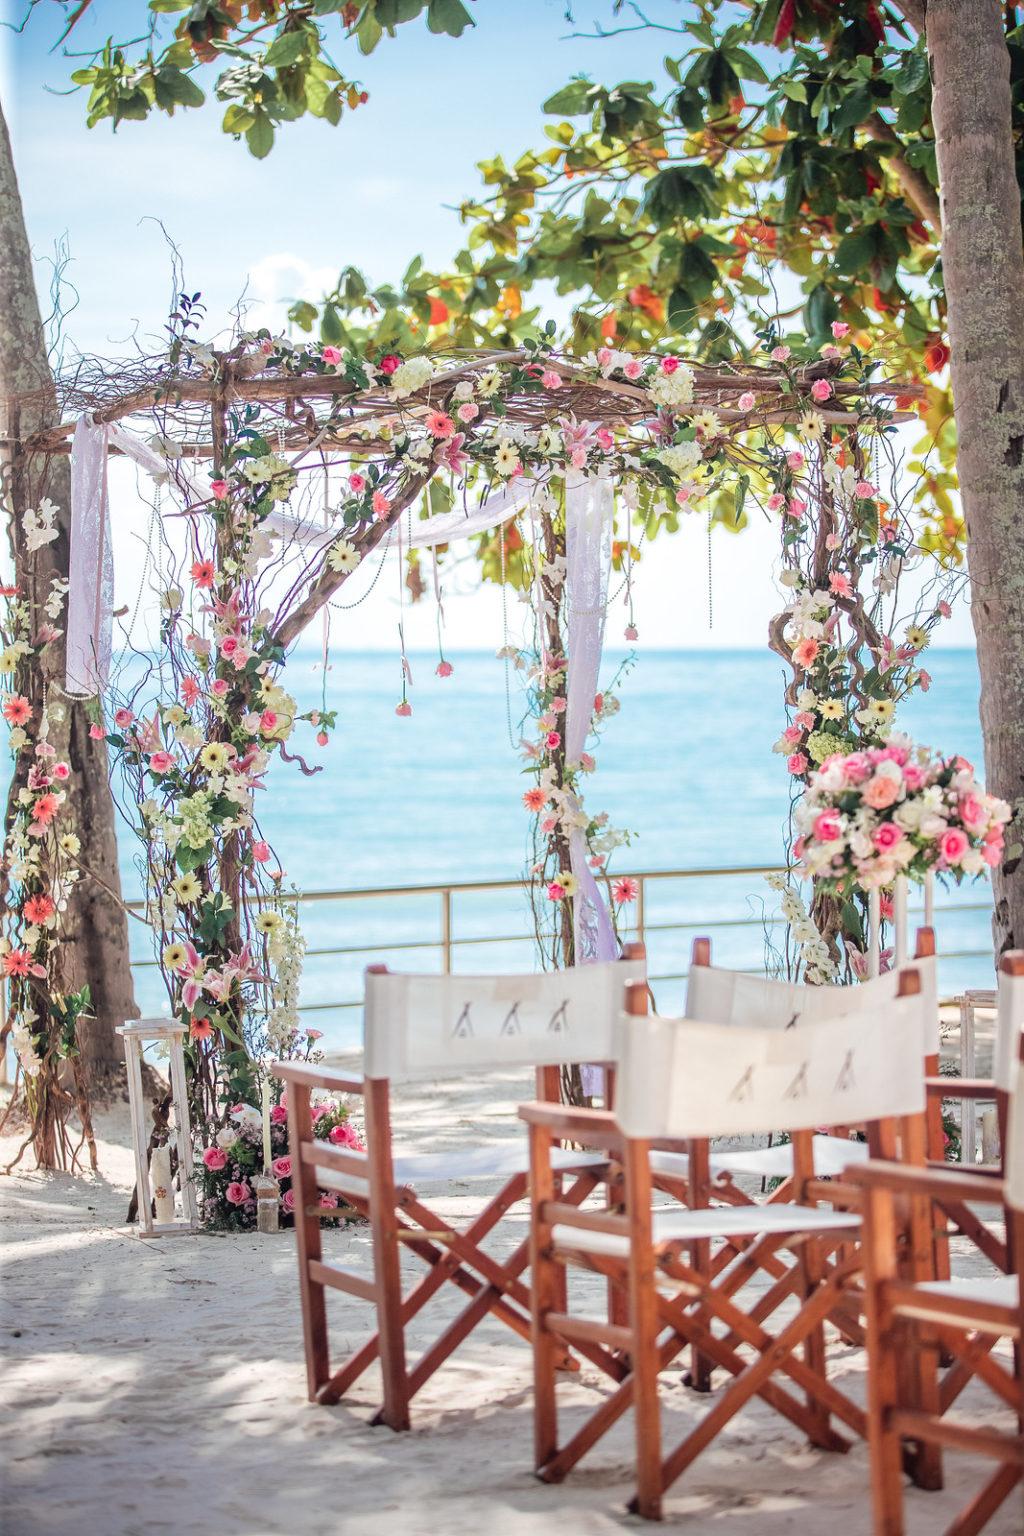 https://www.white-ibiza.com/wp-content/uploads/2020/07/white-ibiza-wedding-venue-nikki-beach-ibiza-2020-04-1024x1536.jpg